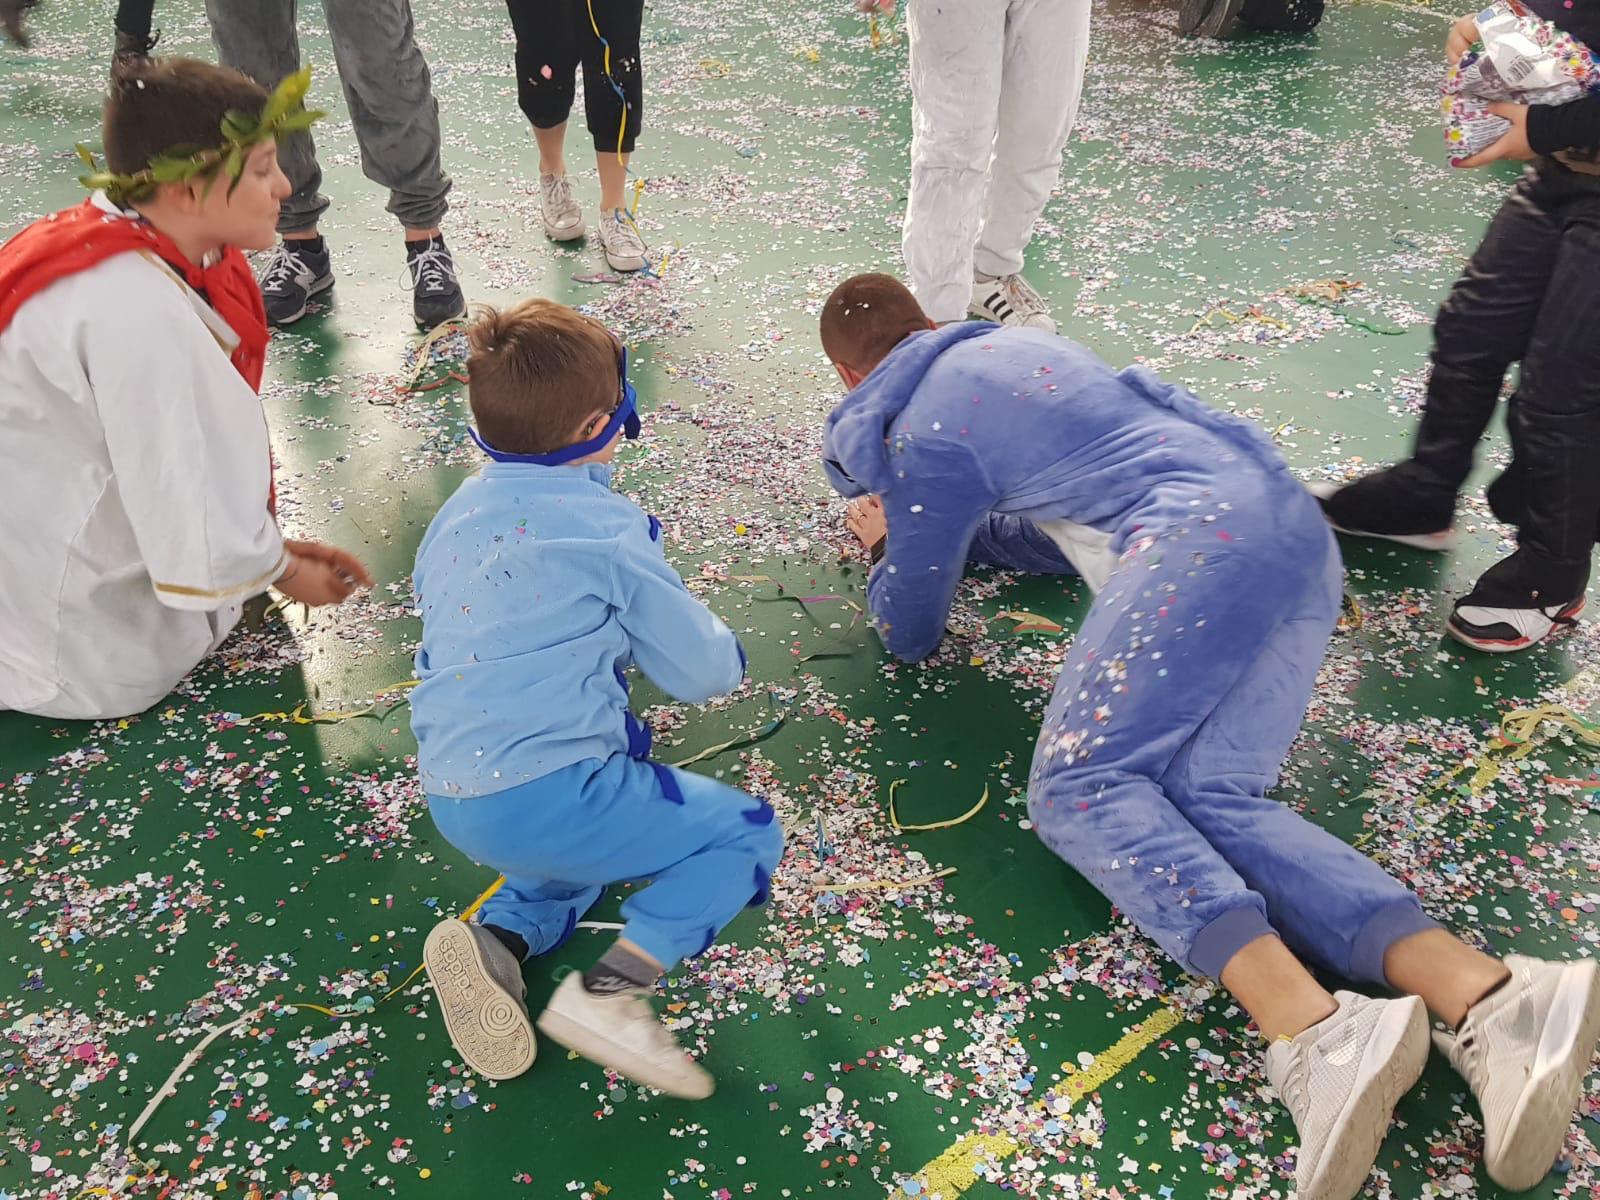 Baraonda Carnevale 2019 (14)